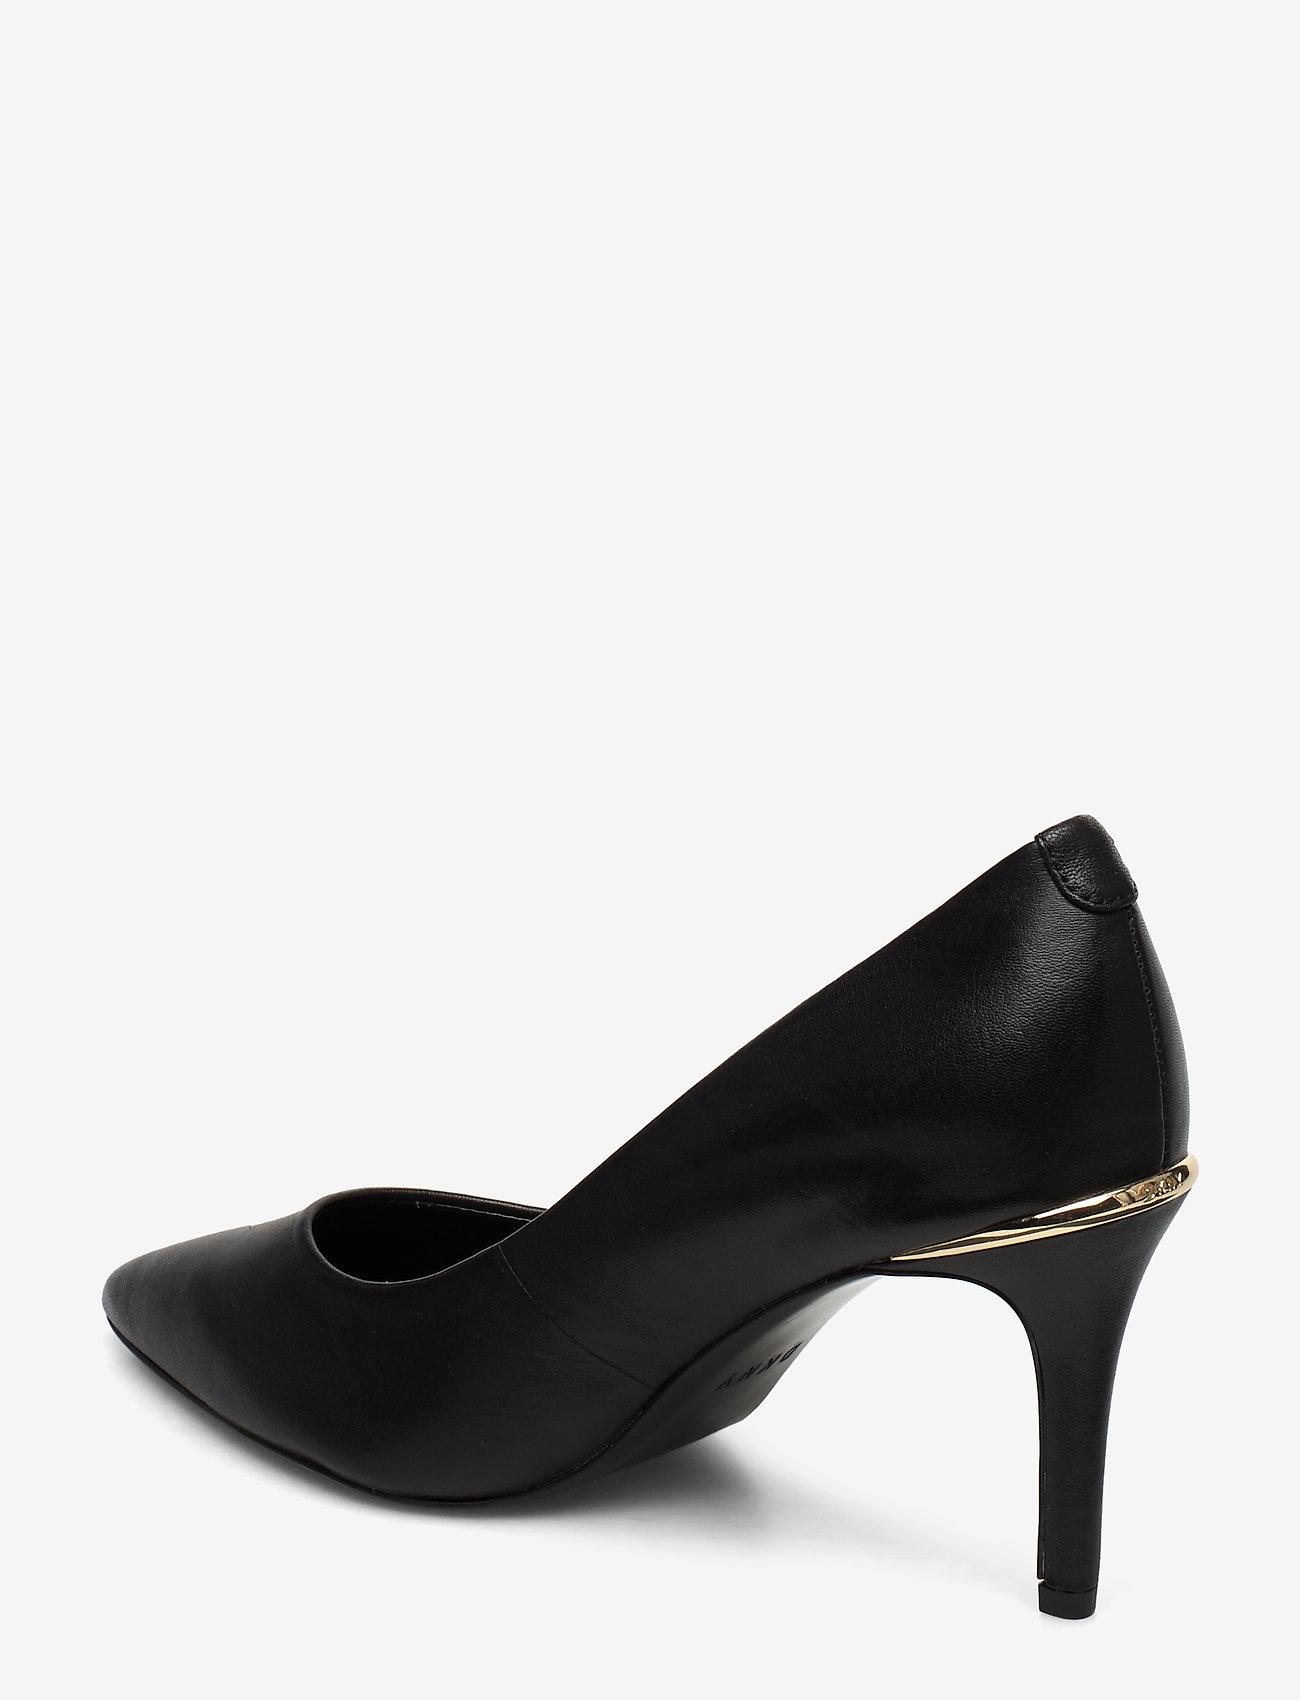 Randi (Black) - DKNY